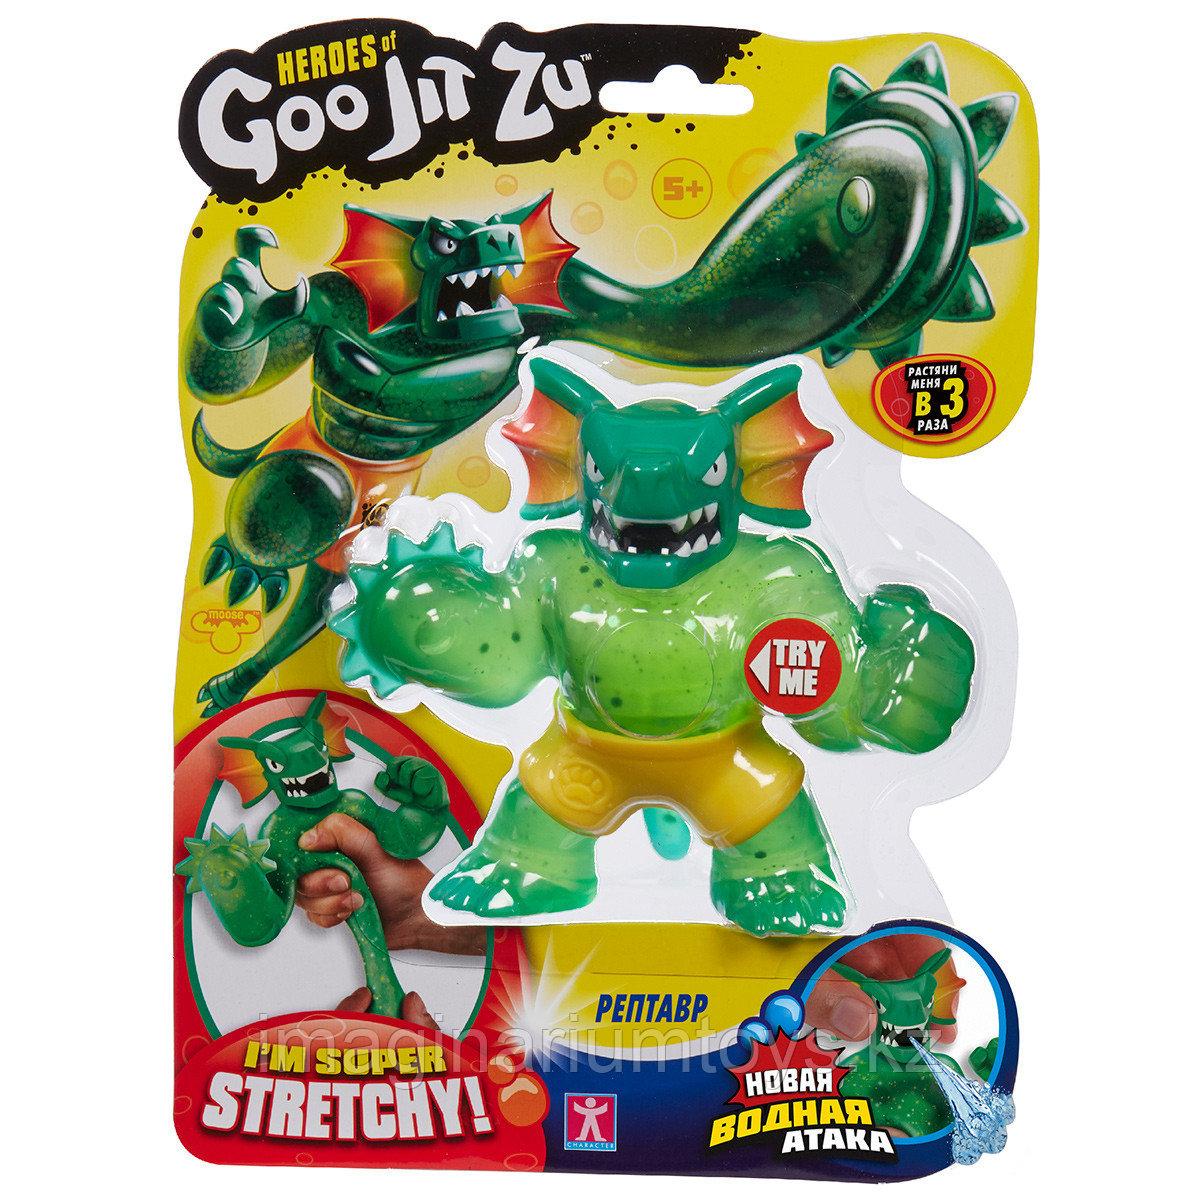 Гуджитсу Динозавр Рептавр Водная атака Goo Jit Zu - фото 8